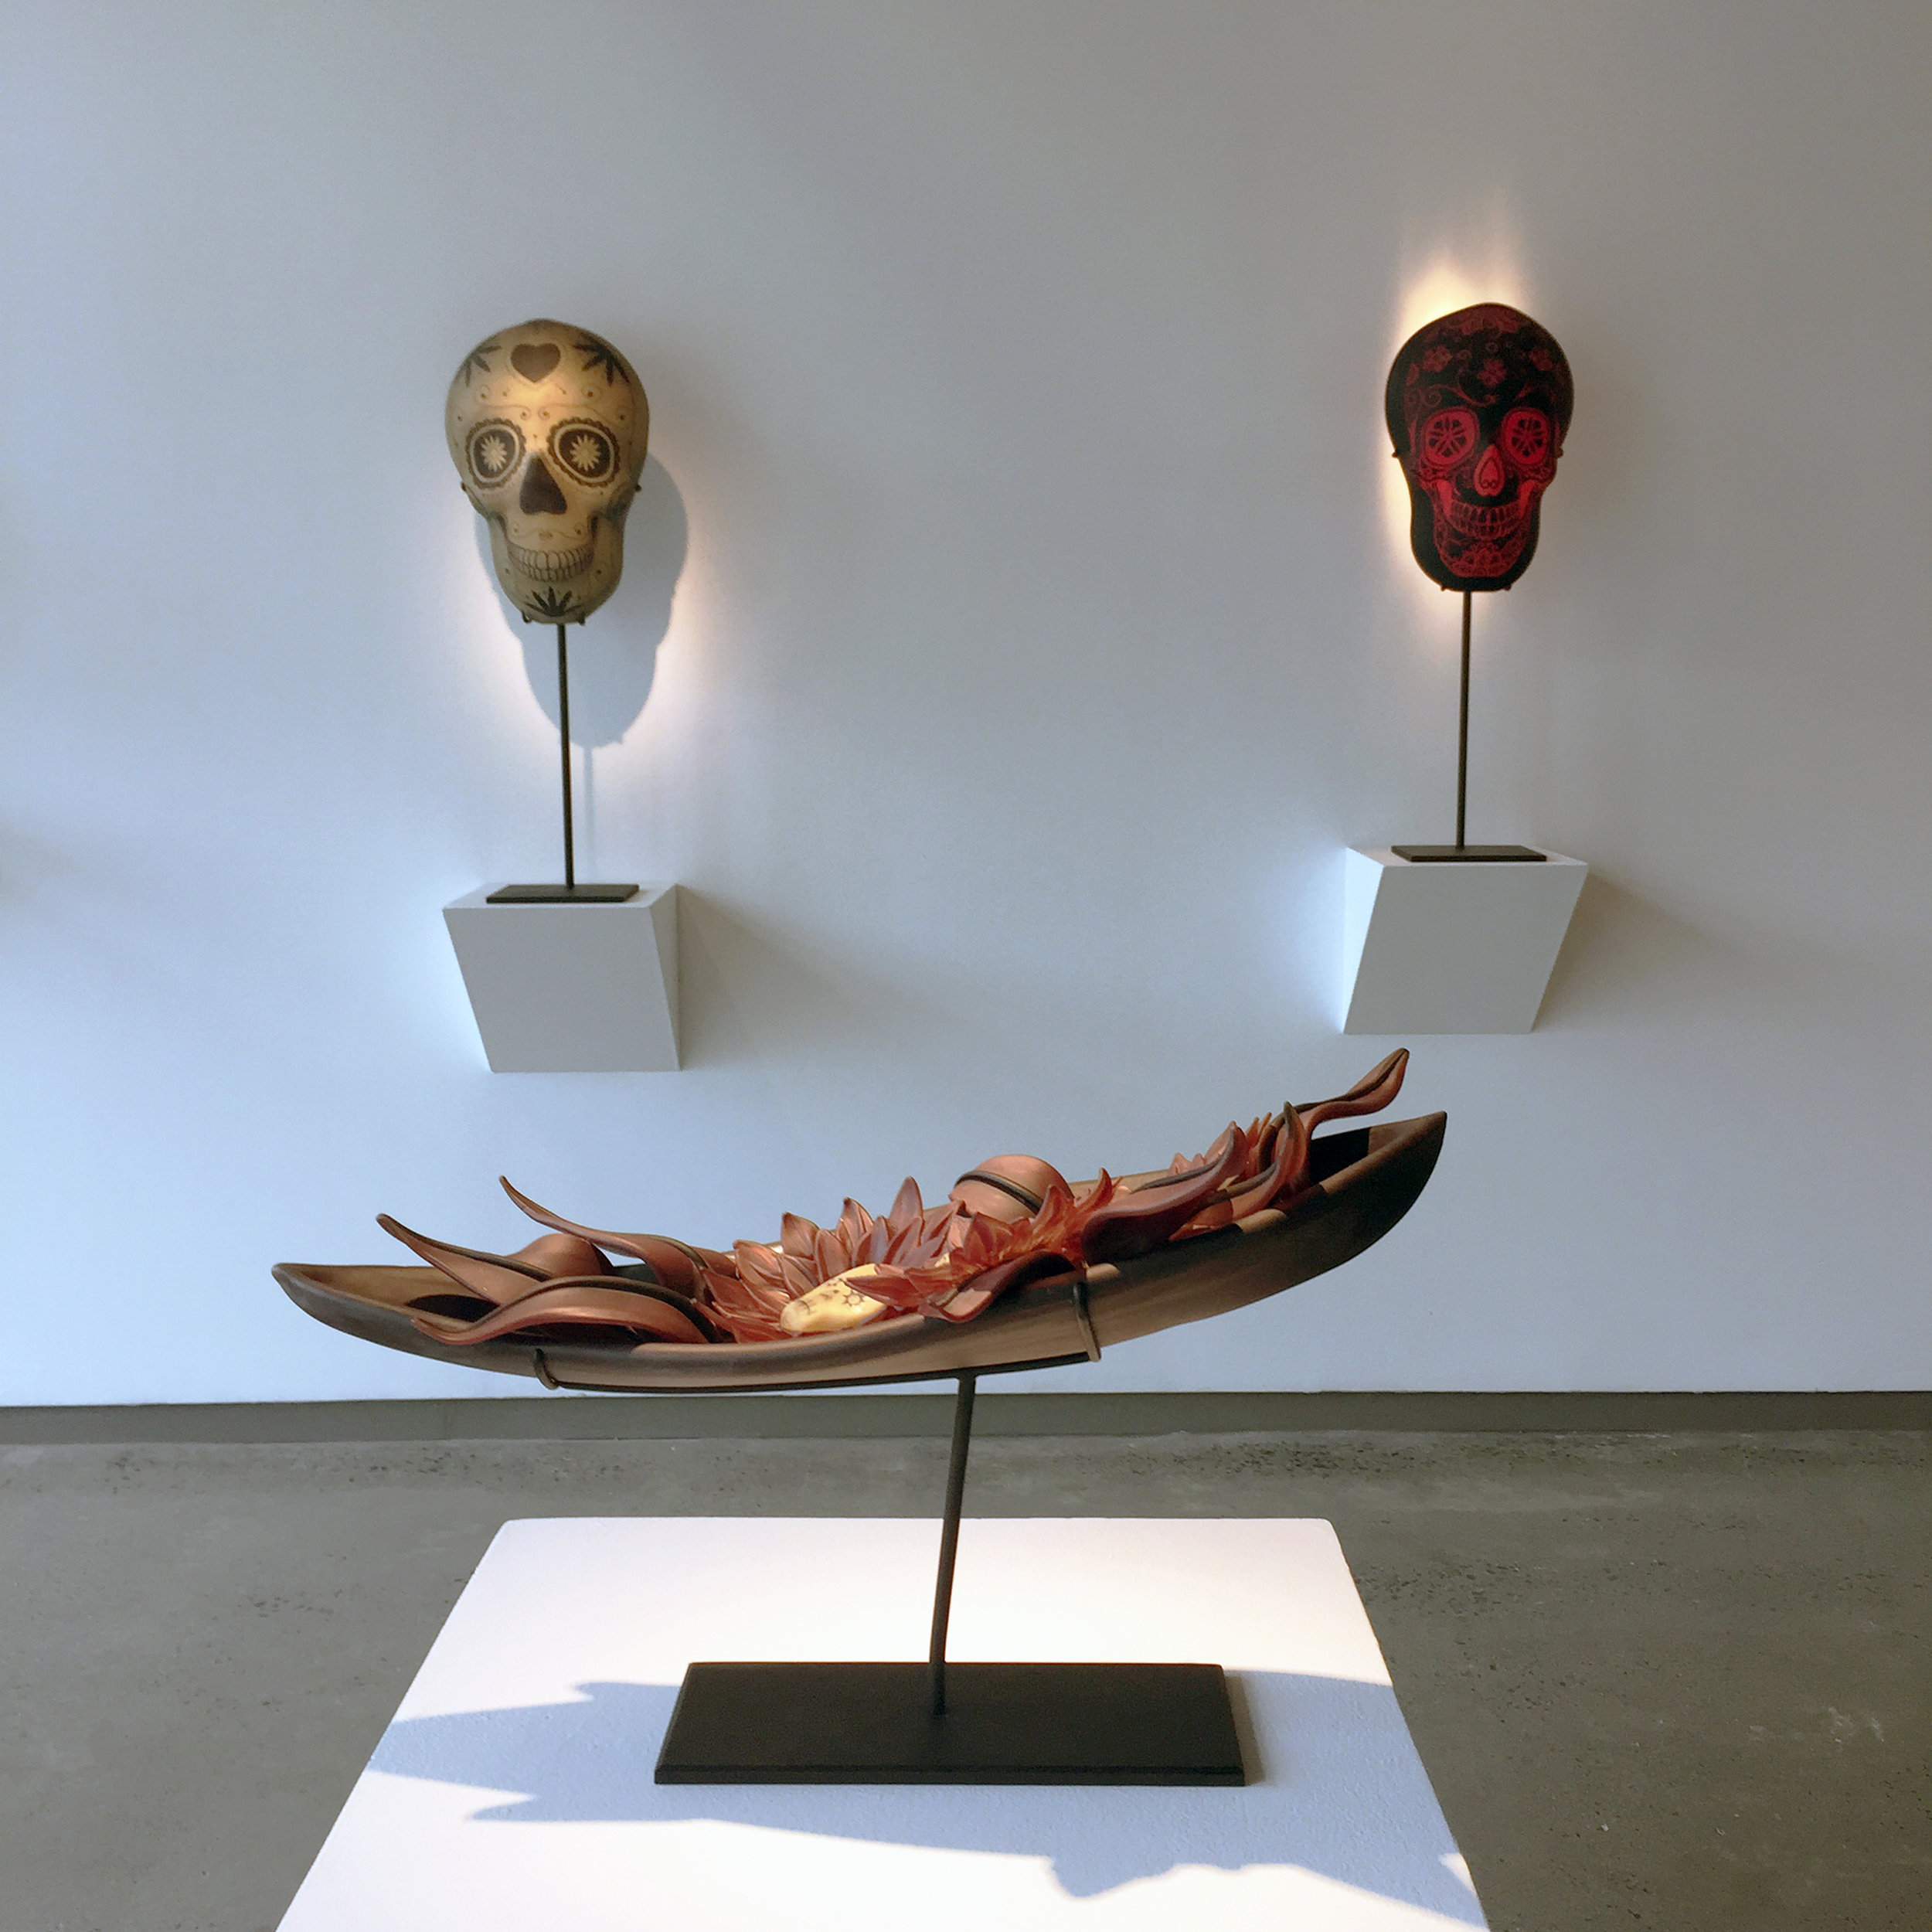 Martin Janecký-installation view 3.jpg